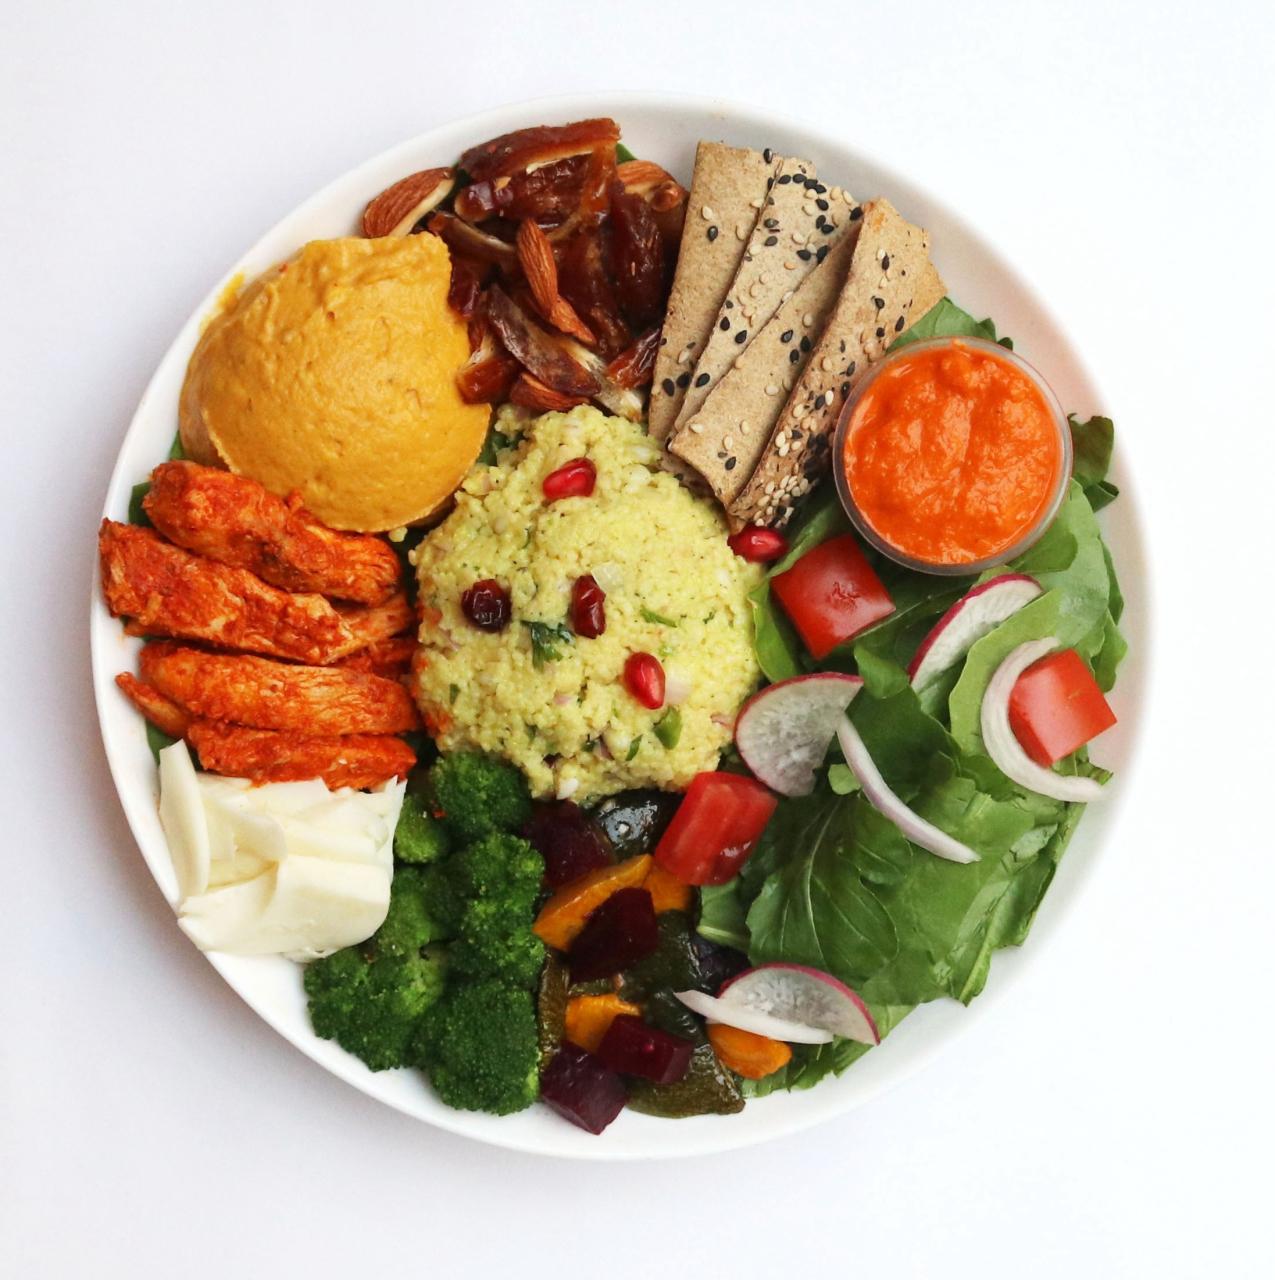 Moroccan Spiced Chicken Bowl (High Protein & Vitamin C)